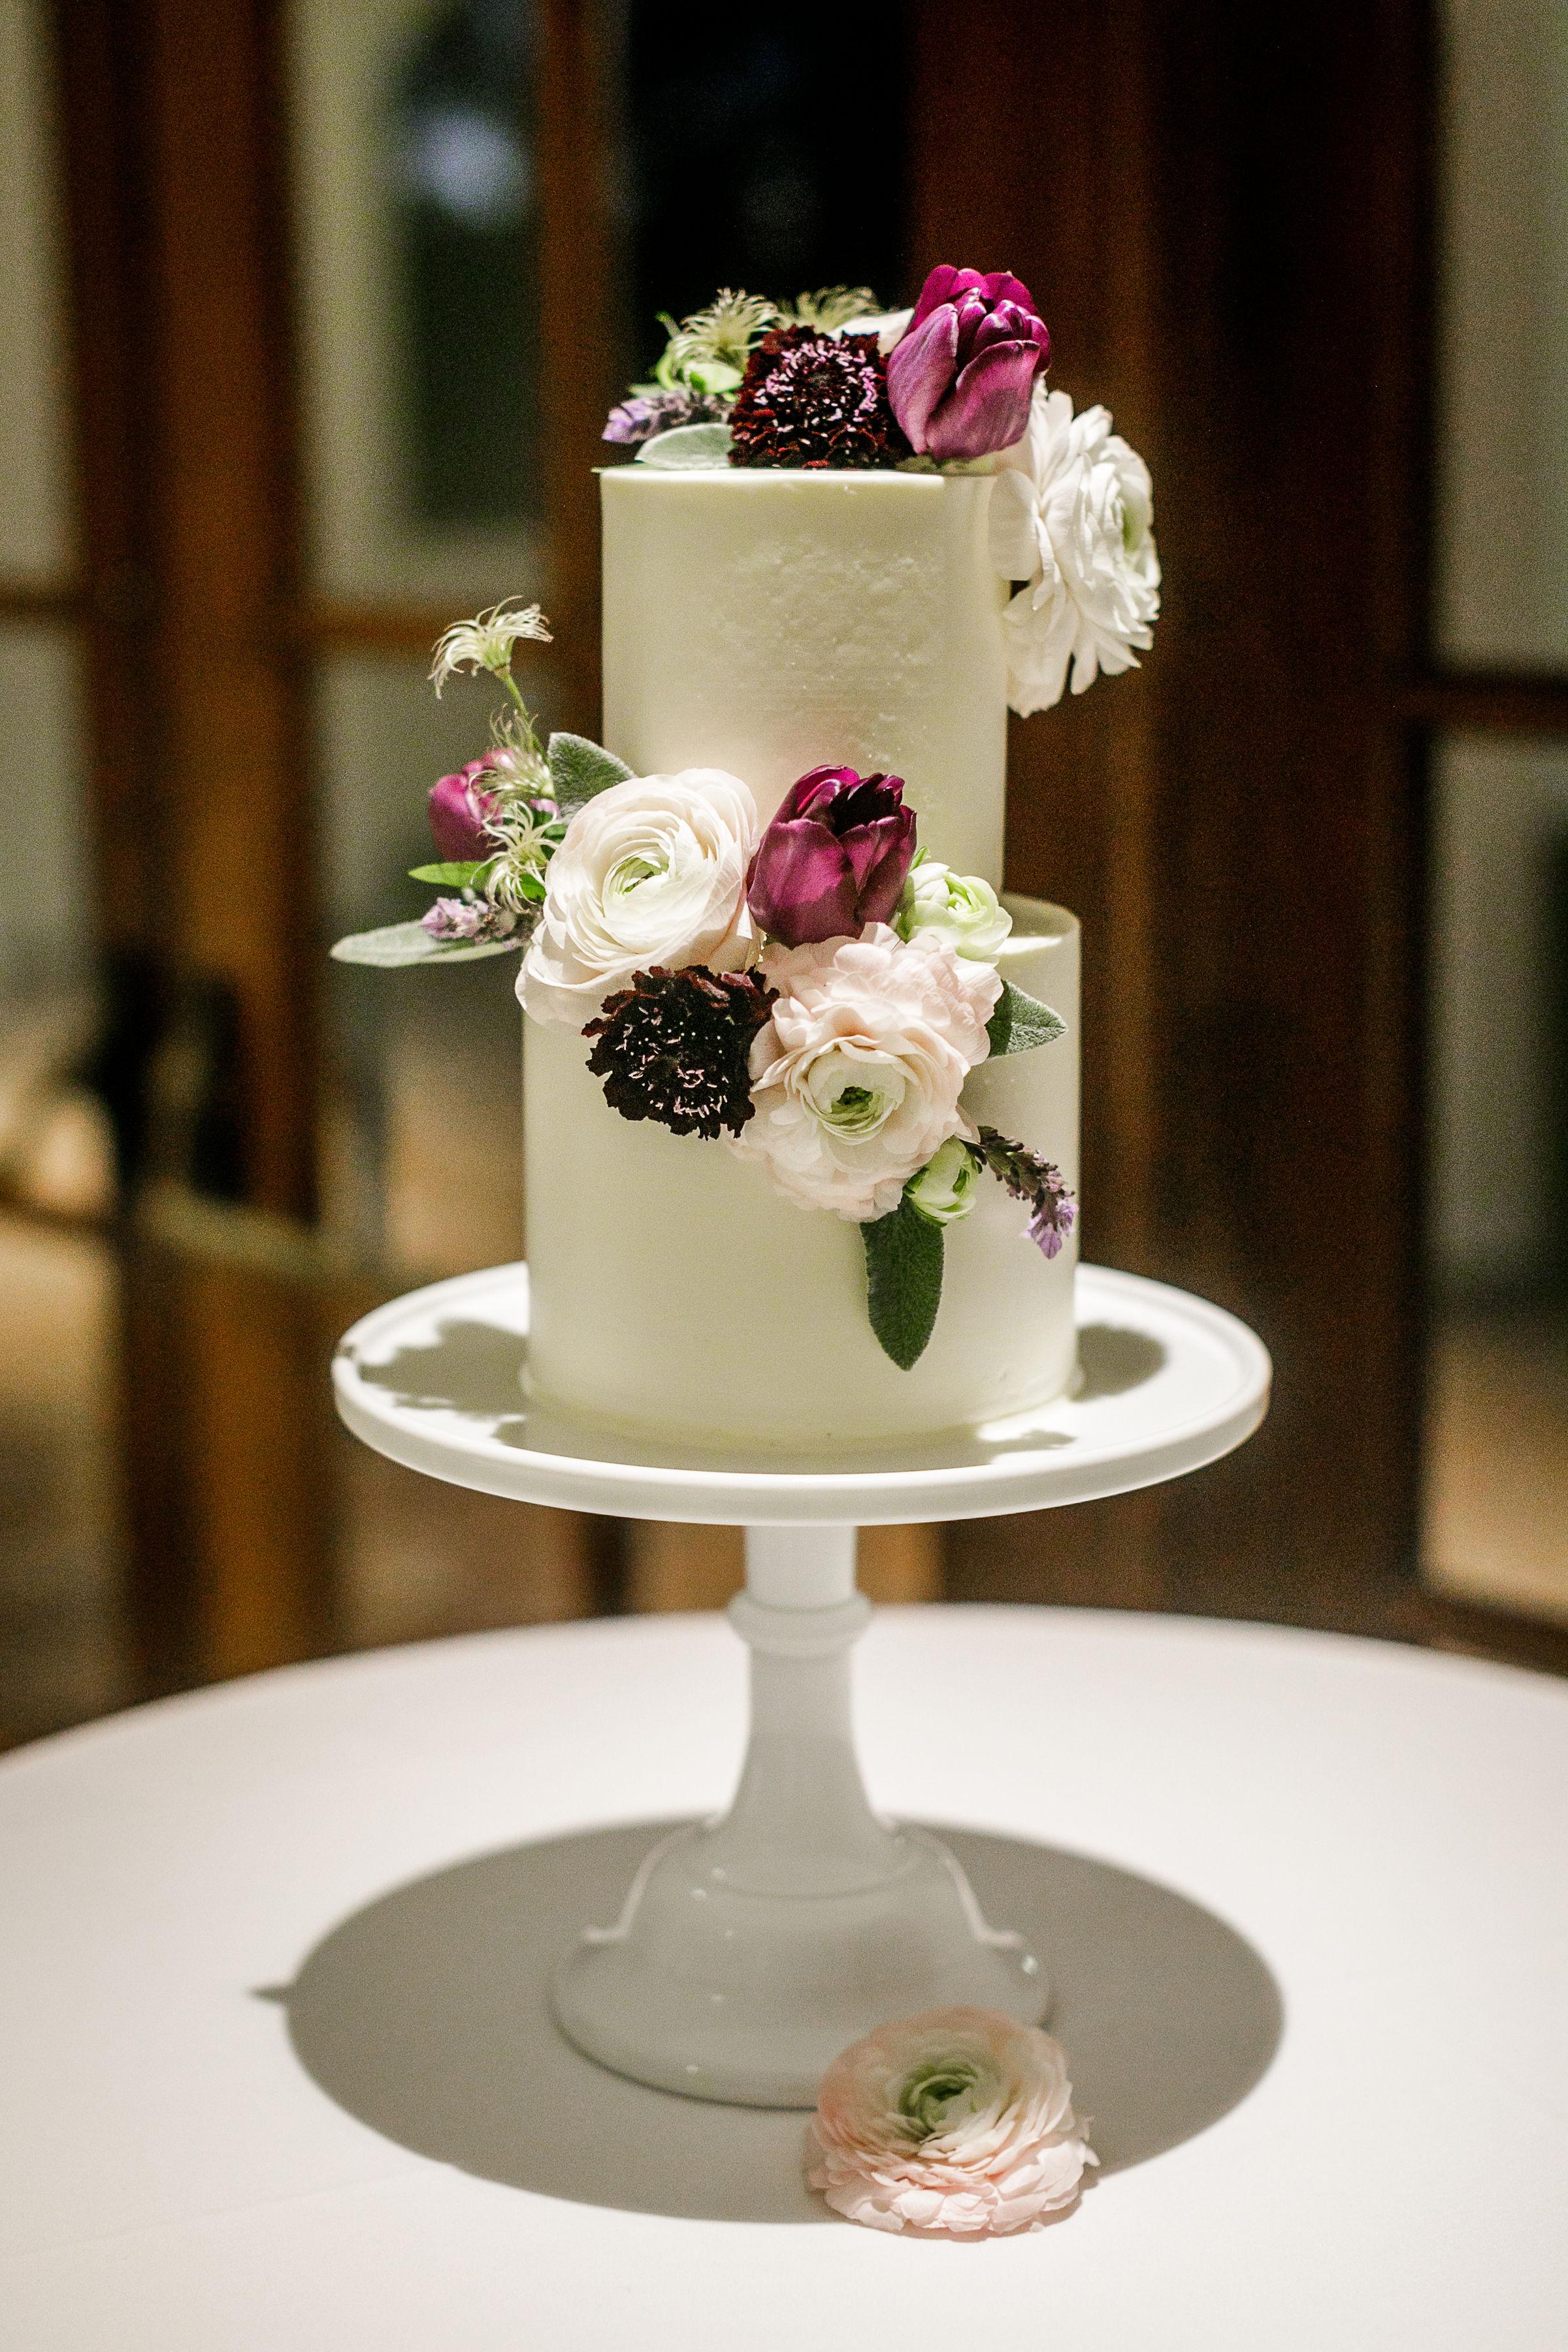 www.santabarbarawedding.com   Kiel Rucker Photography   The Ritz Carlton Bacara   Event of the Season   Cody Floral Design   Wedding Cake